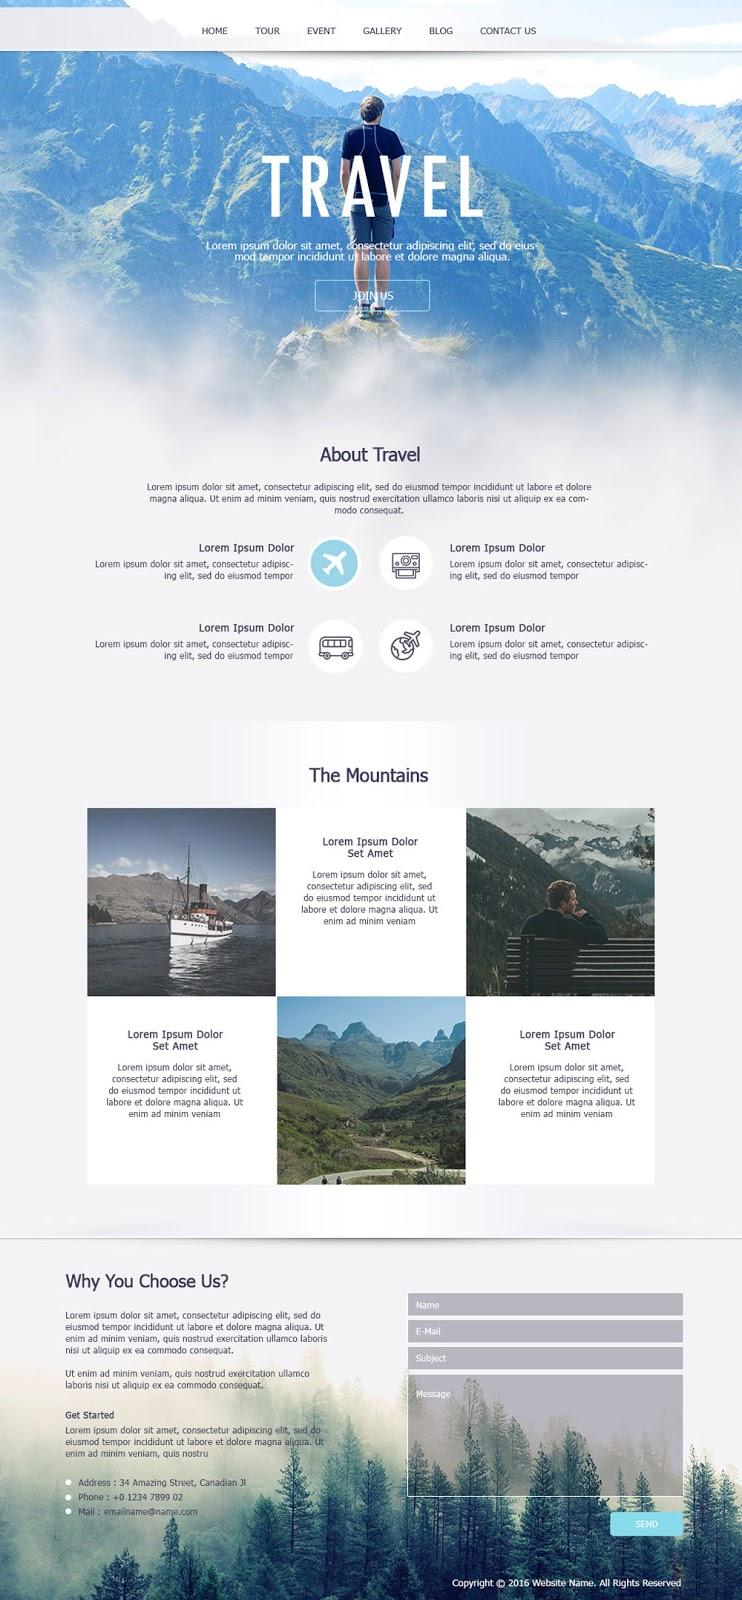 Design Travel Single Page Website Using Photoshop